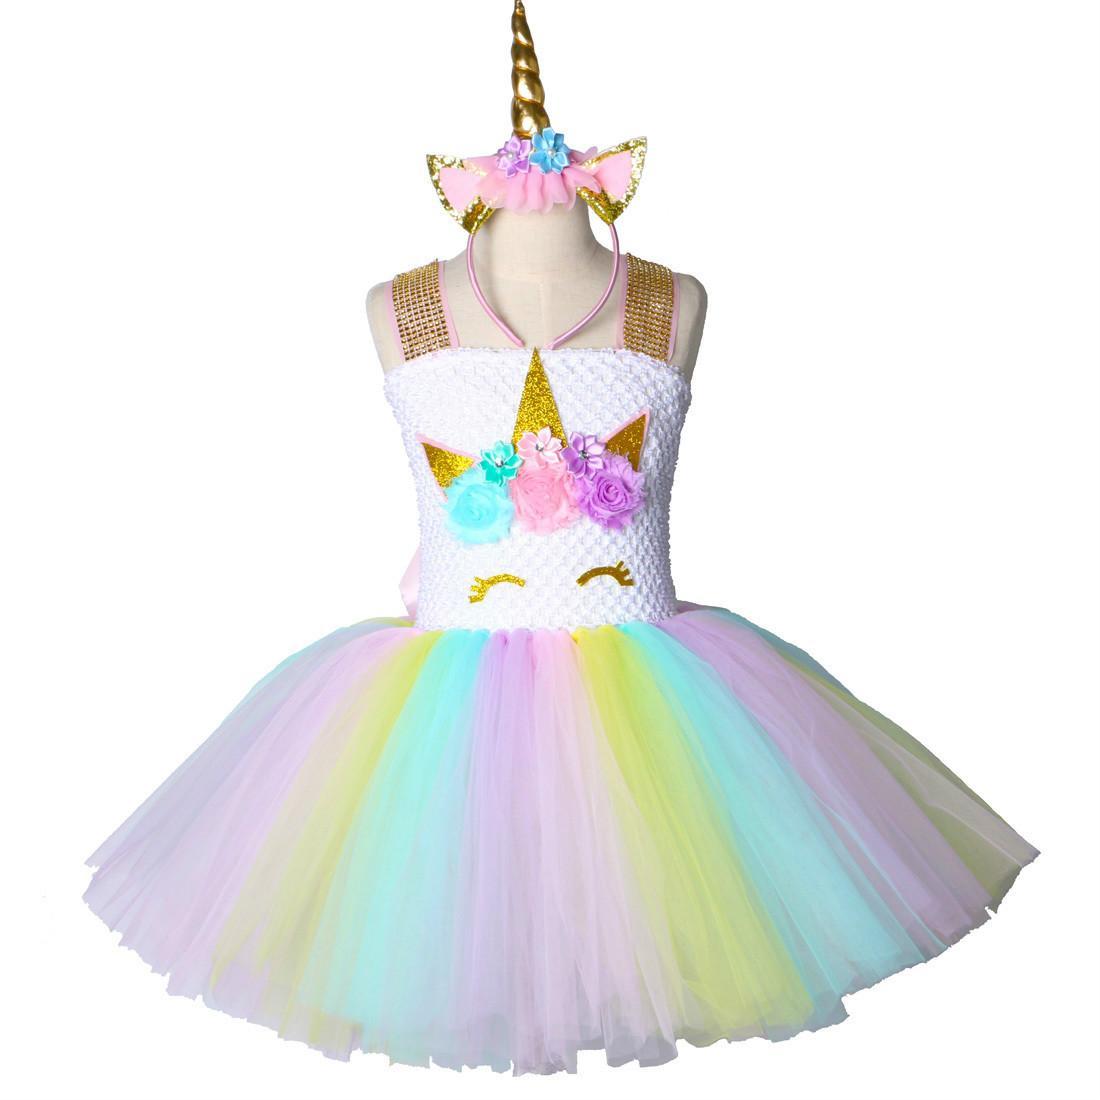 fb8e3ac58ed1 Children Girls Unicorn Tutu Dress Rainbow Princess Kids Birthday Party Dress  Girls Christmas Halloween Pony Cosplay Costume 1 14 Girls Dress Shoes For  Kids ...